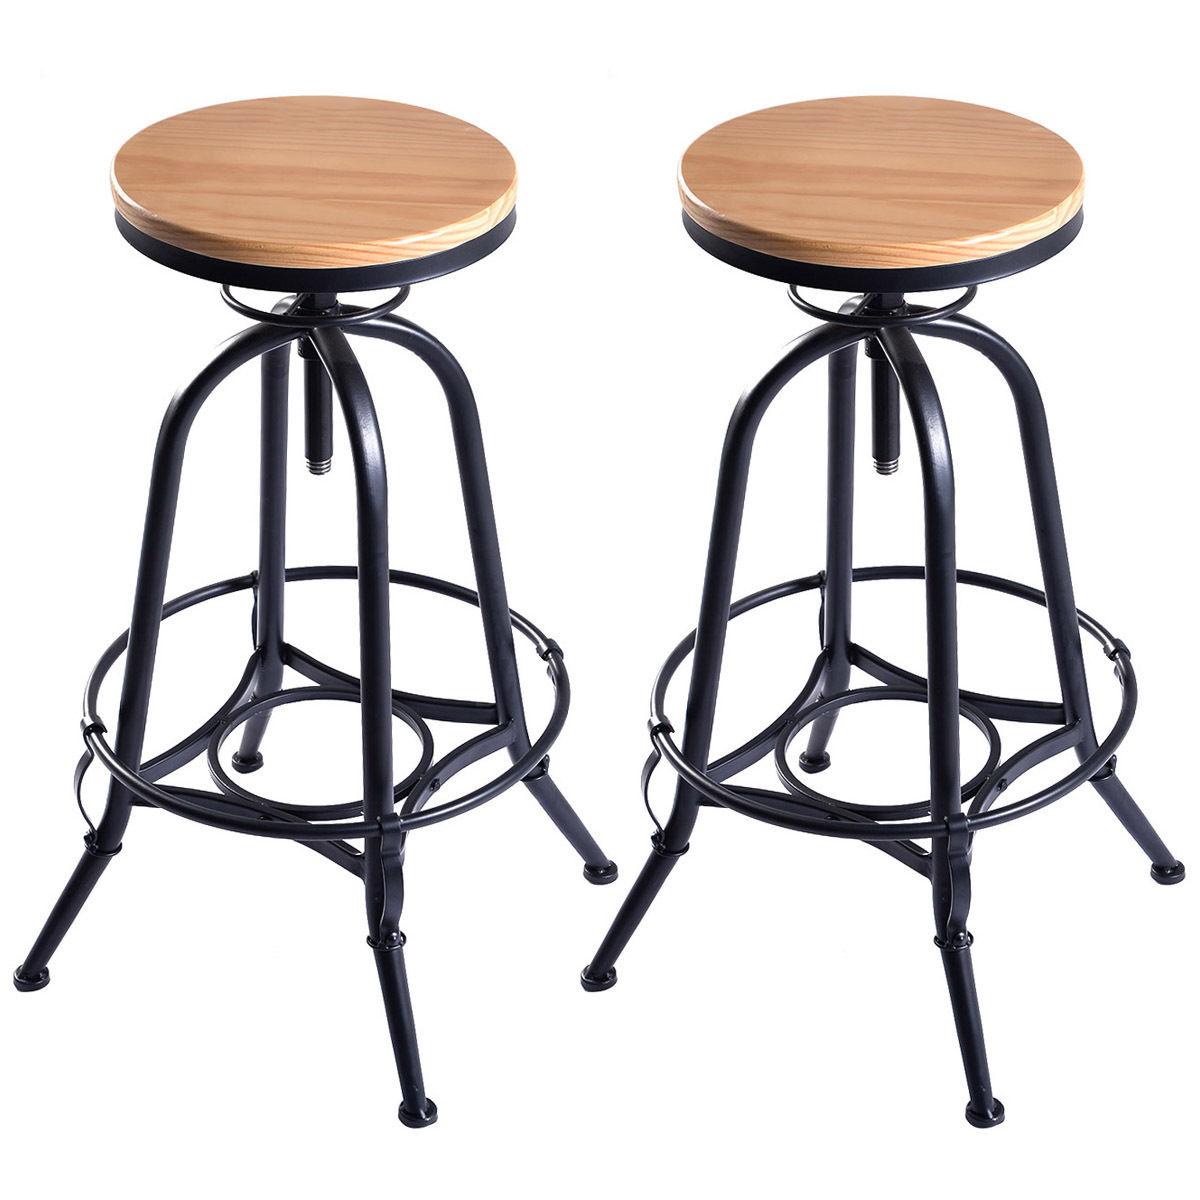 Giantex Set Of 2 Vintage Bar Stools Industrial Wood Top Metal Design Pub Stool Chairs Adjustable Swivel Bar Stool 2*HW51305